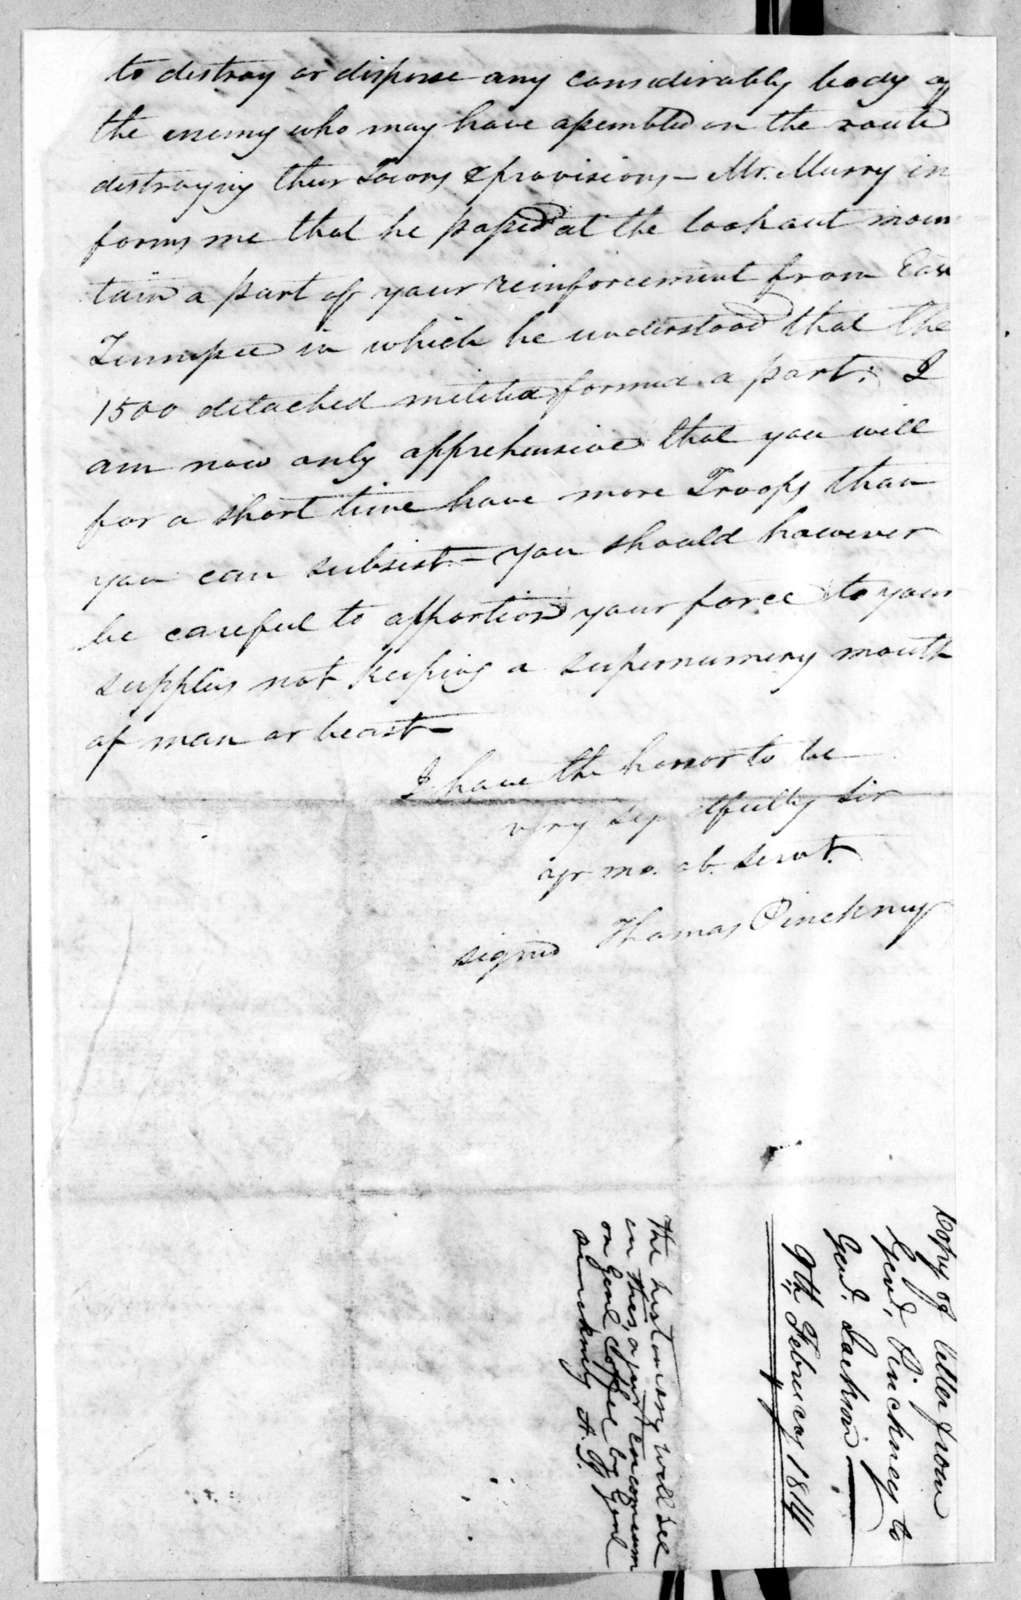 Thomas Pinckney to Andrew Jackson, February 9, 1814